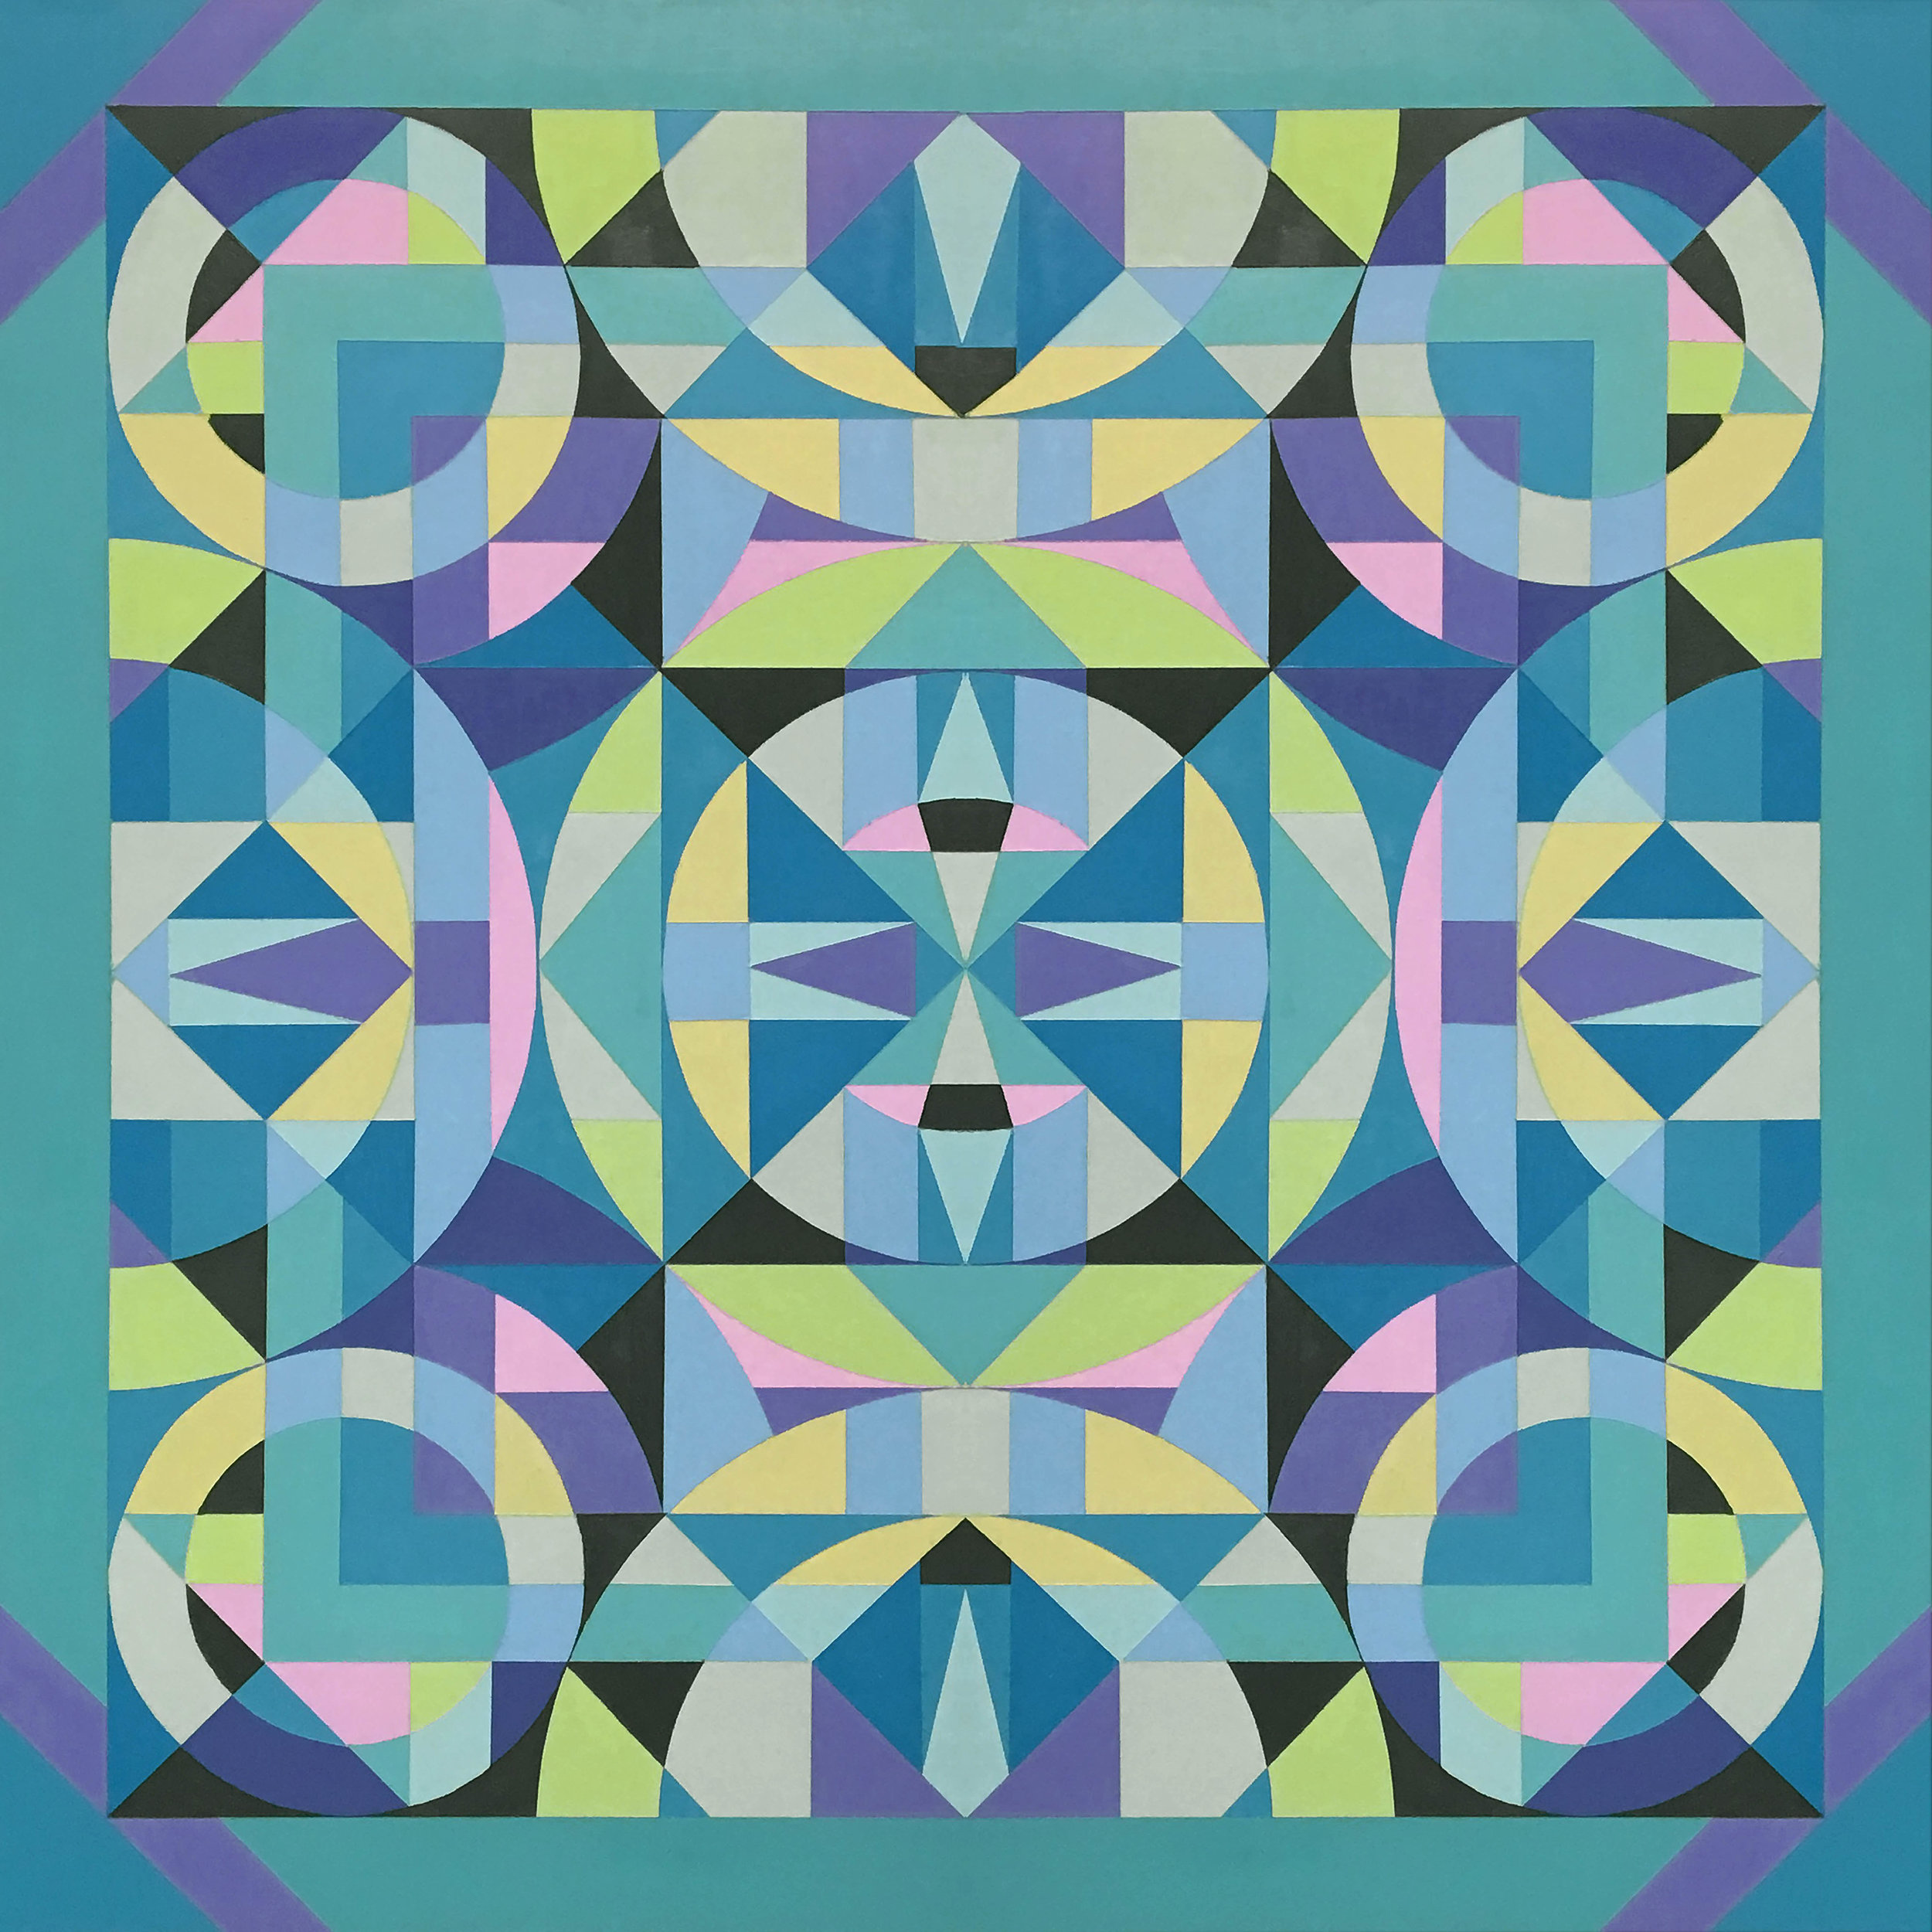 Square Spots 5